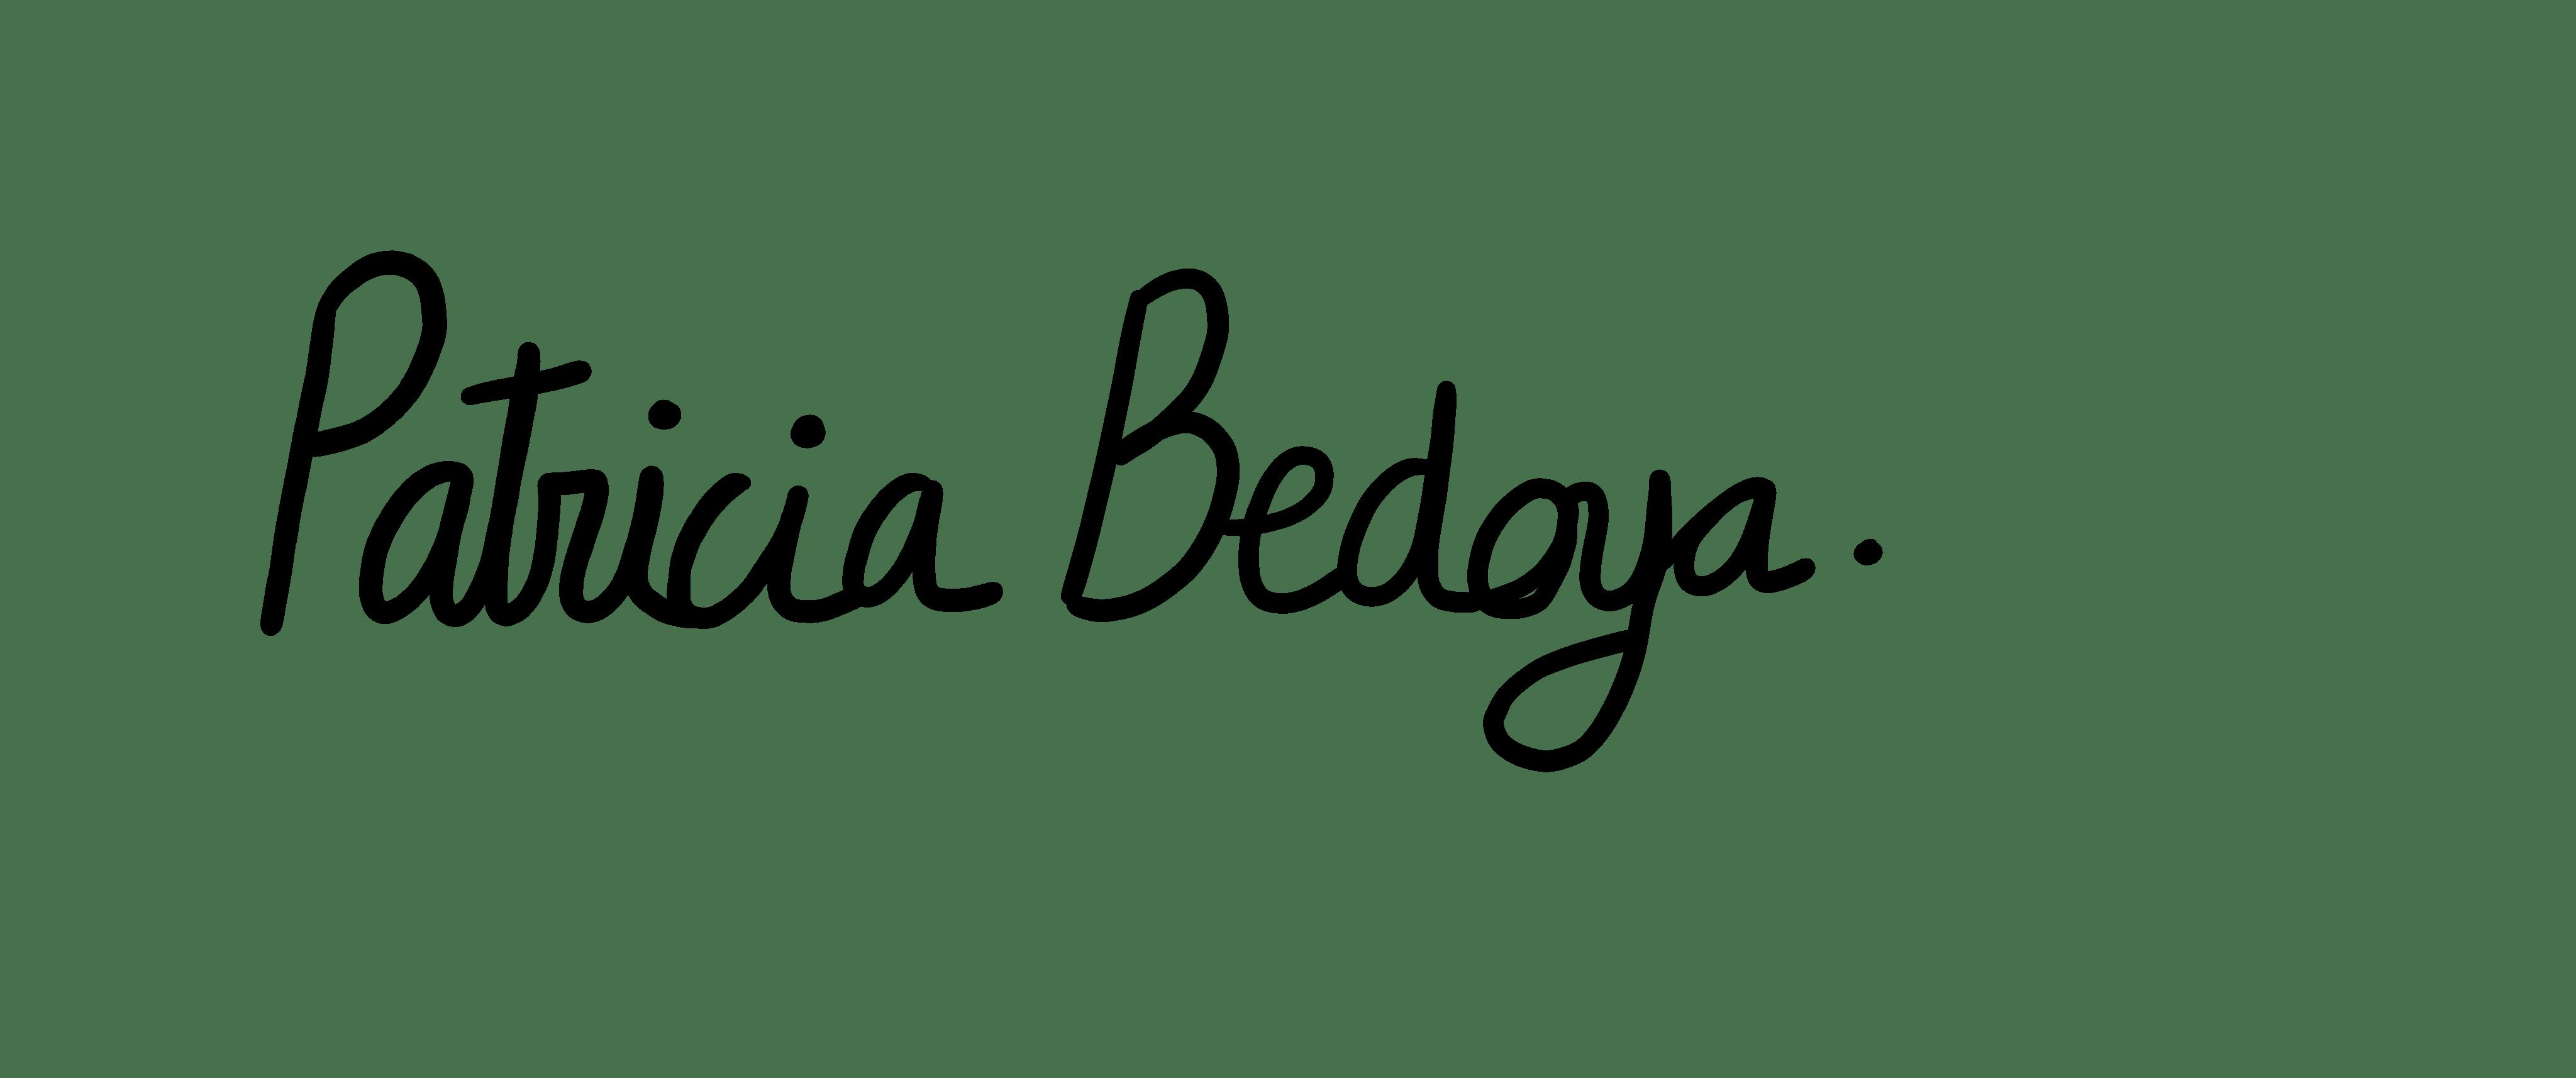 Patricia Bedoya Logo